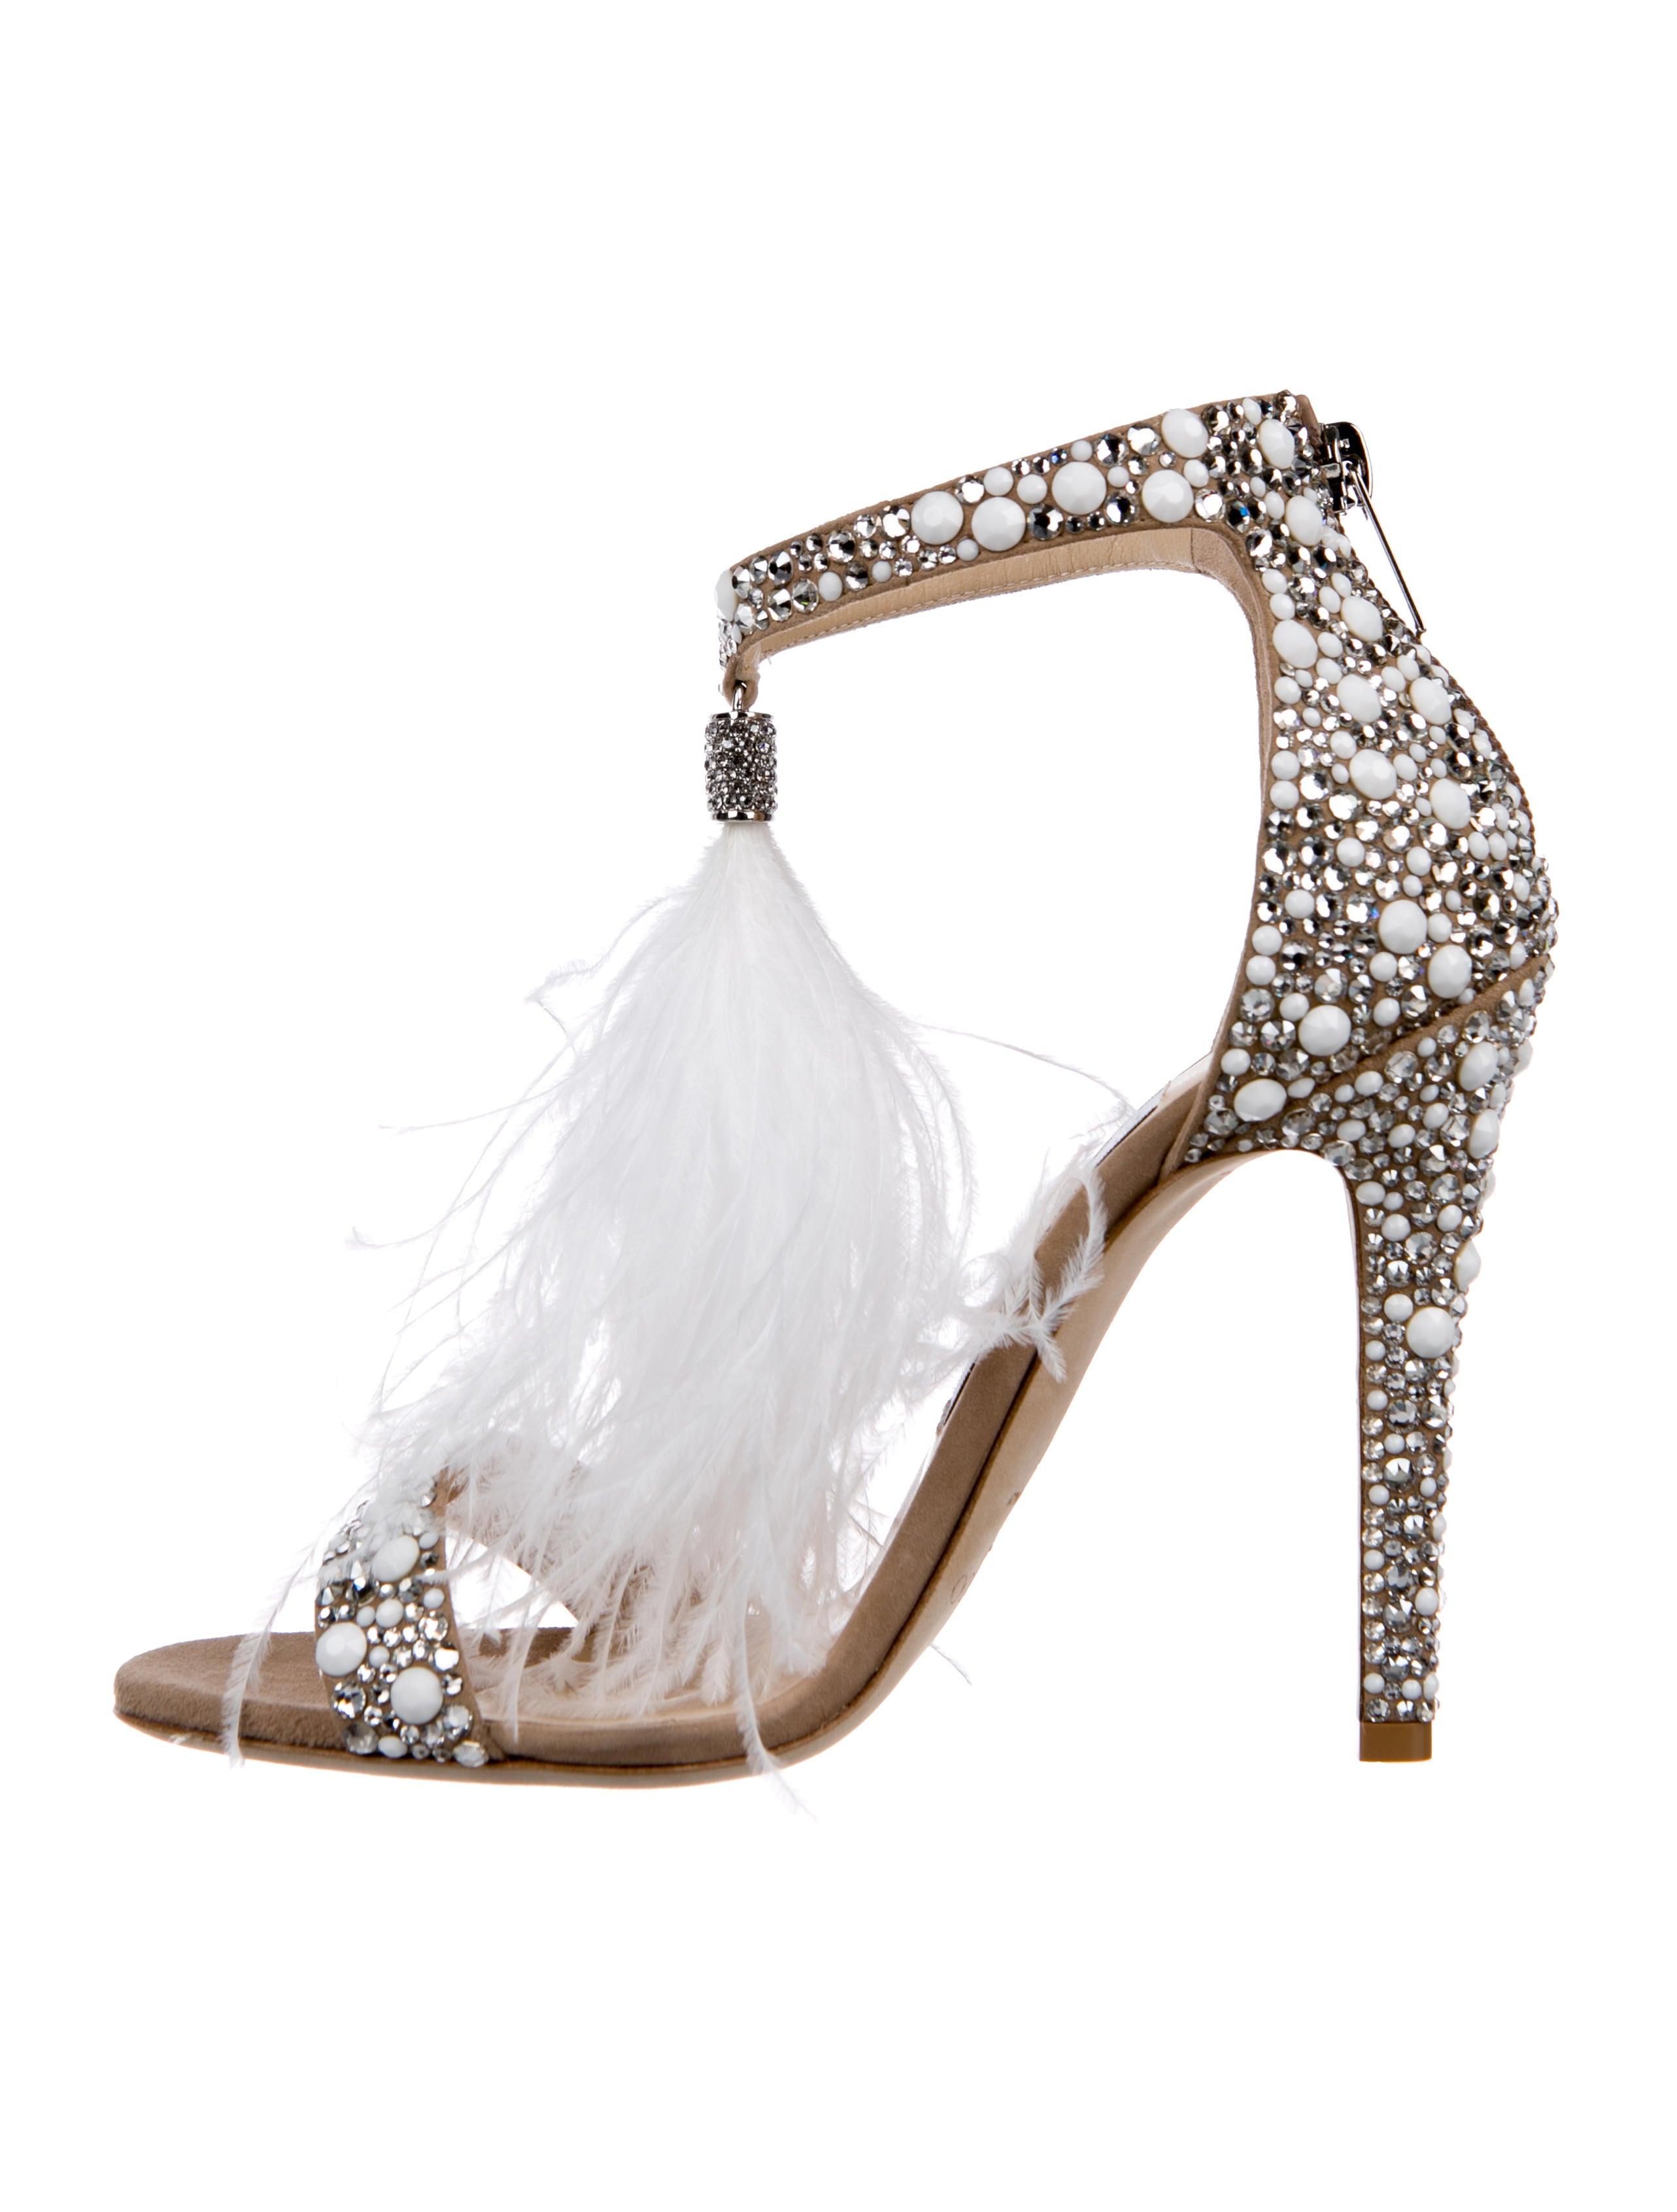 46becef3f1c Jimmy Choo 2018 Viola 110 Embellished Sandals - Shoes - JIM95718 ...